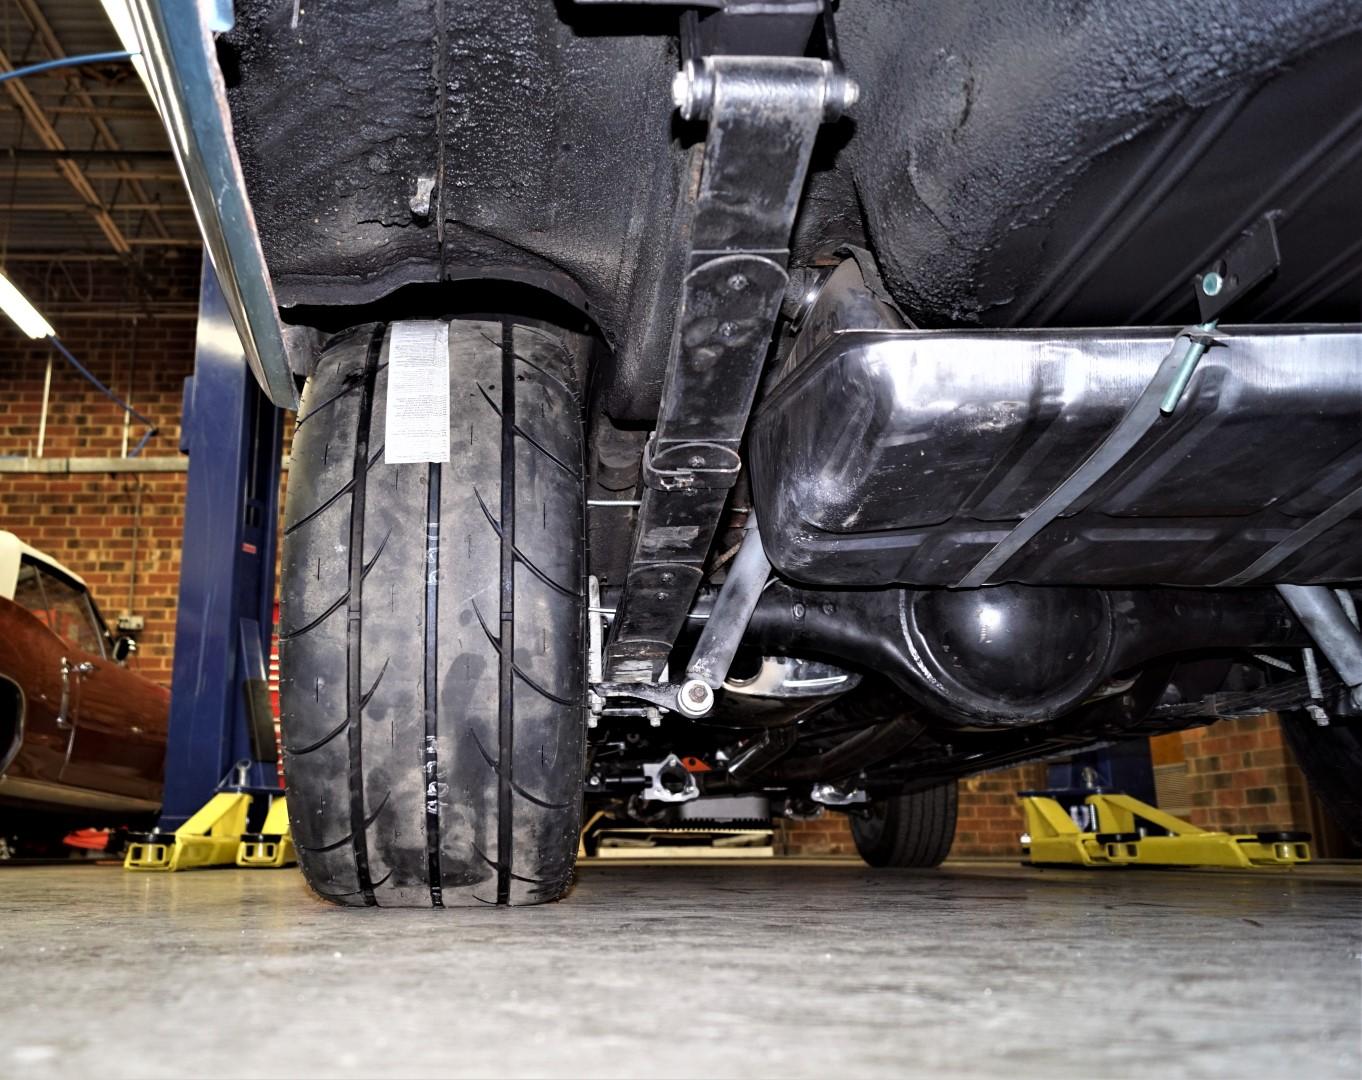 1968 Camaro Wiring Harness Retainer Clips Dodge Demon Mini Tub 2018 Dodge Reviews